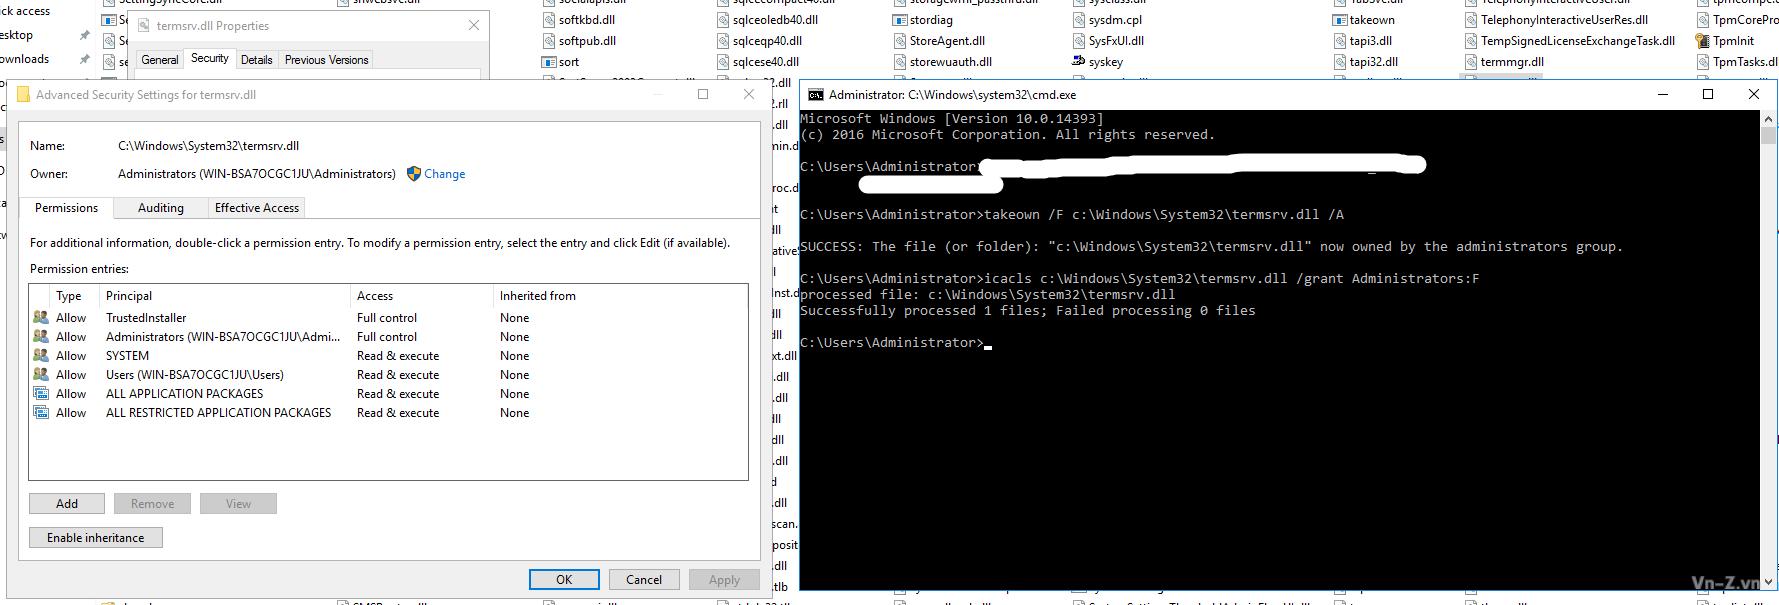 Windows-Server-2016-Multi-RDP-06.png